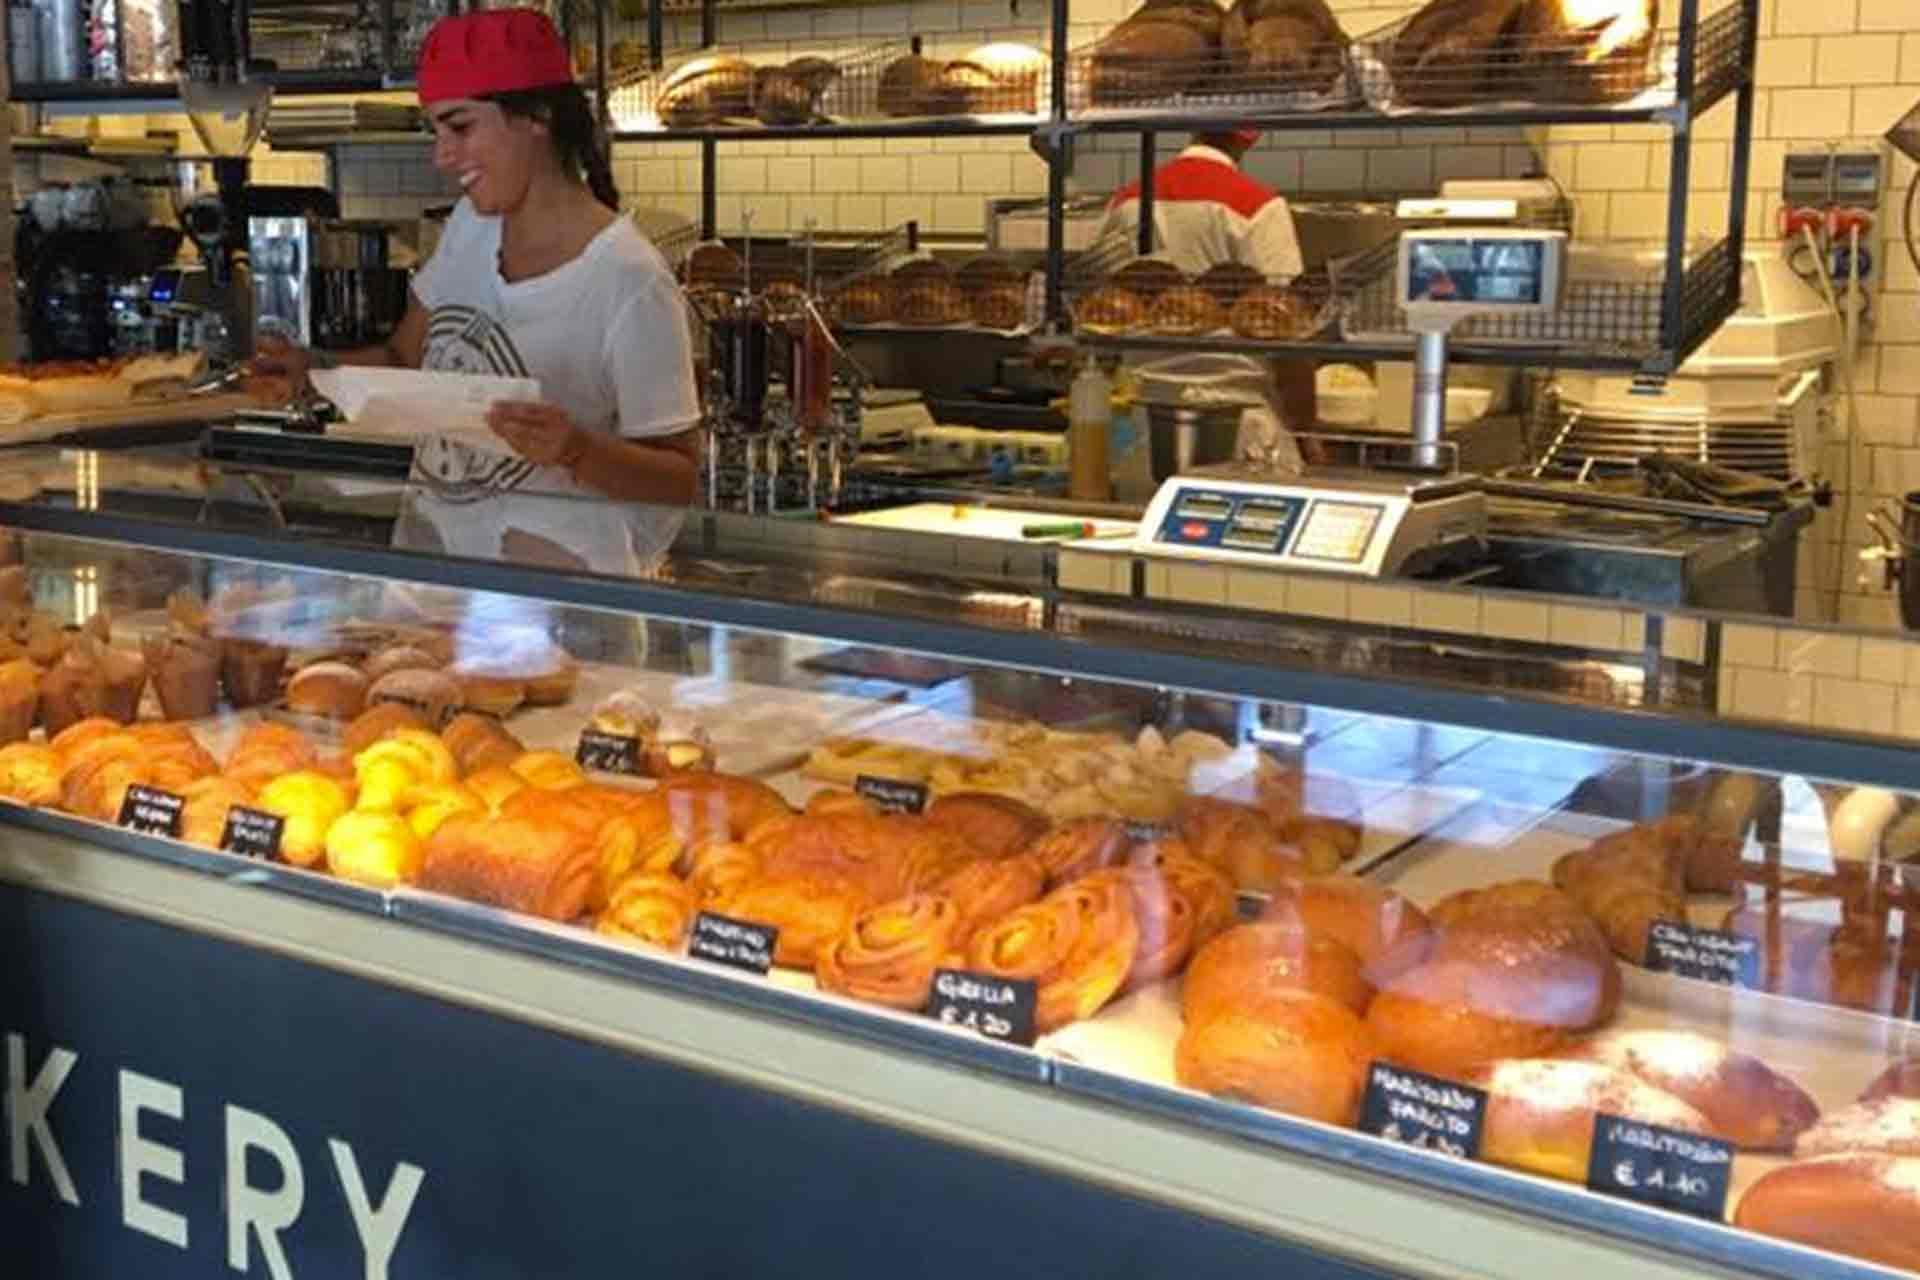 panificio in stile bakery